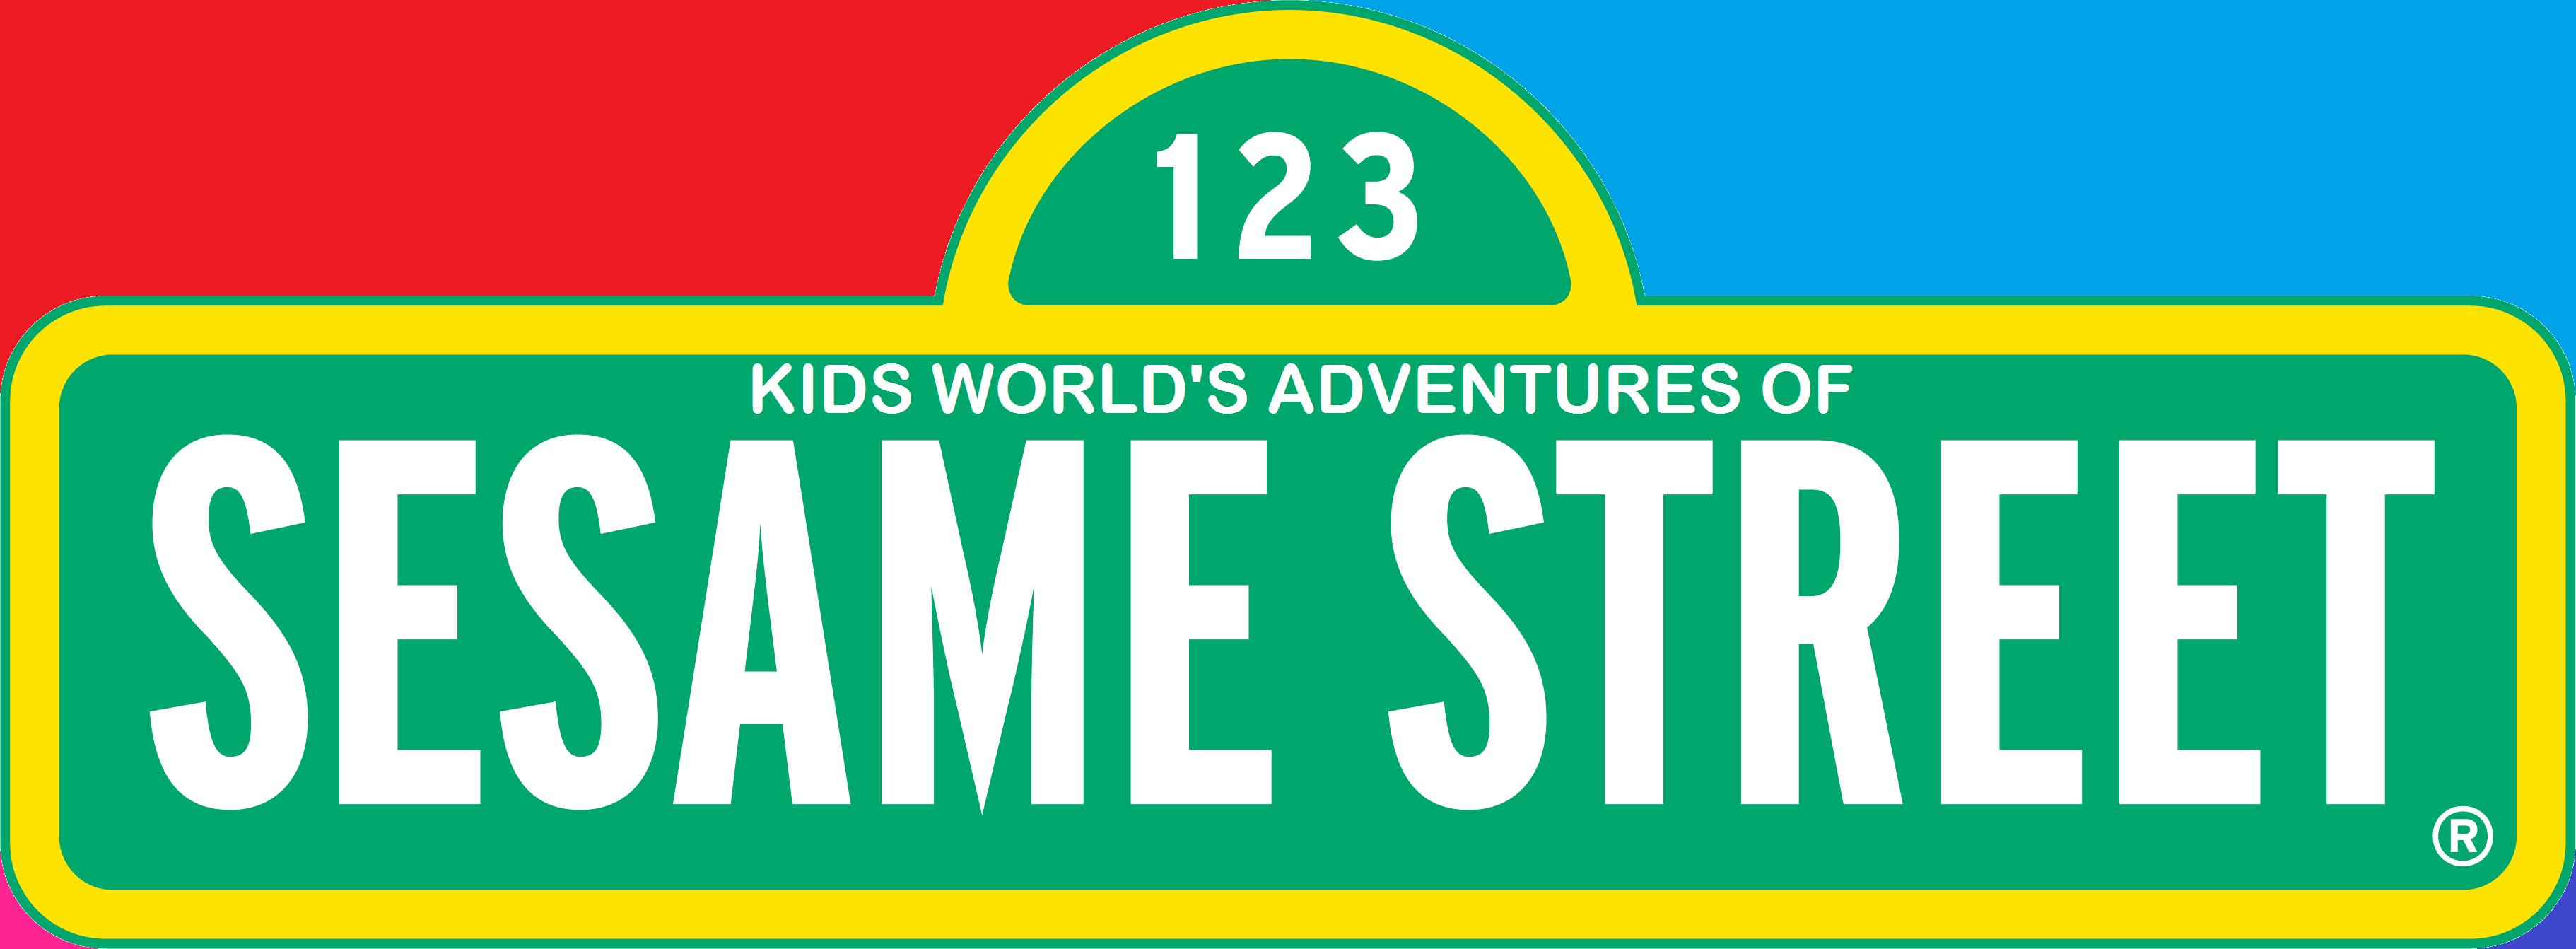 Blake Foster's Adventures of Sesame Street